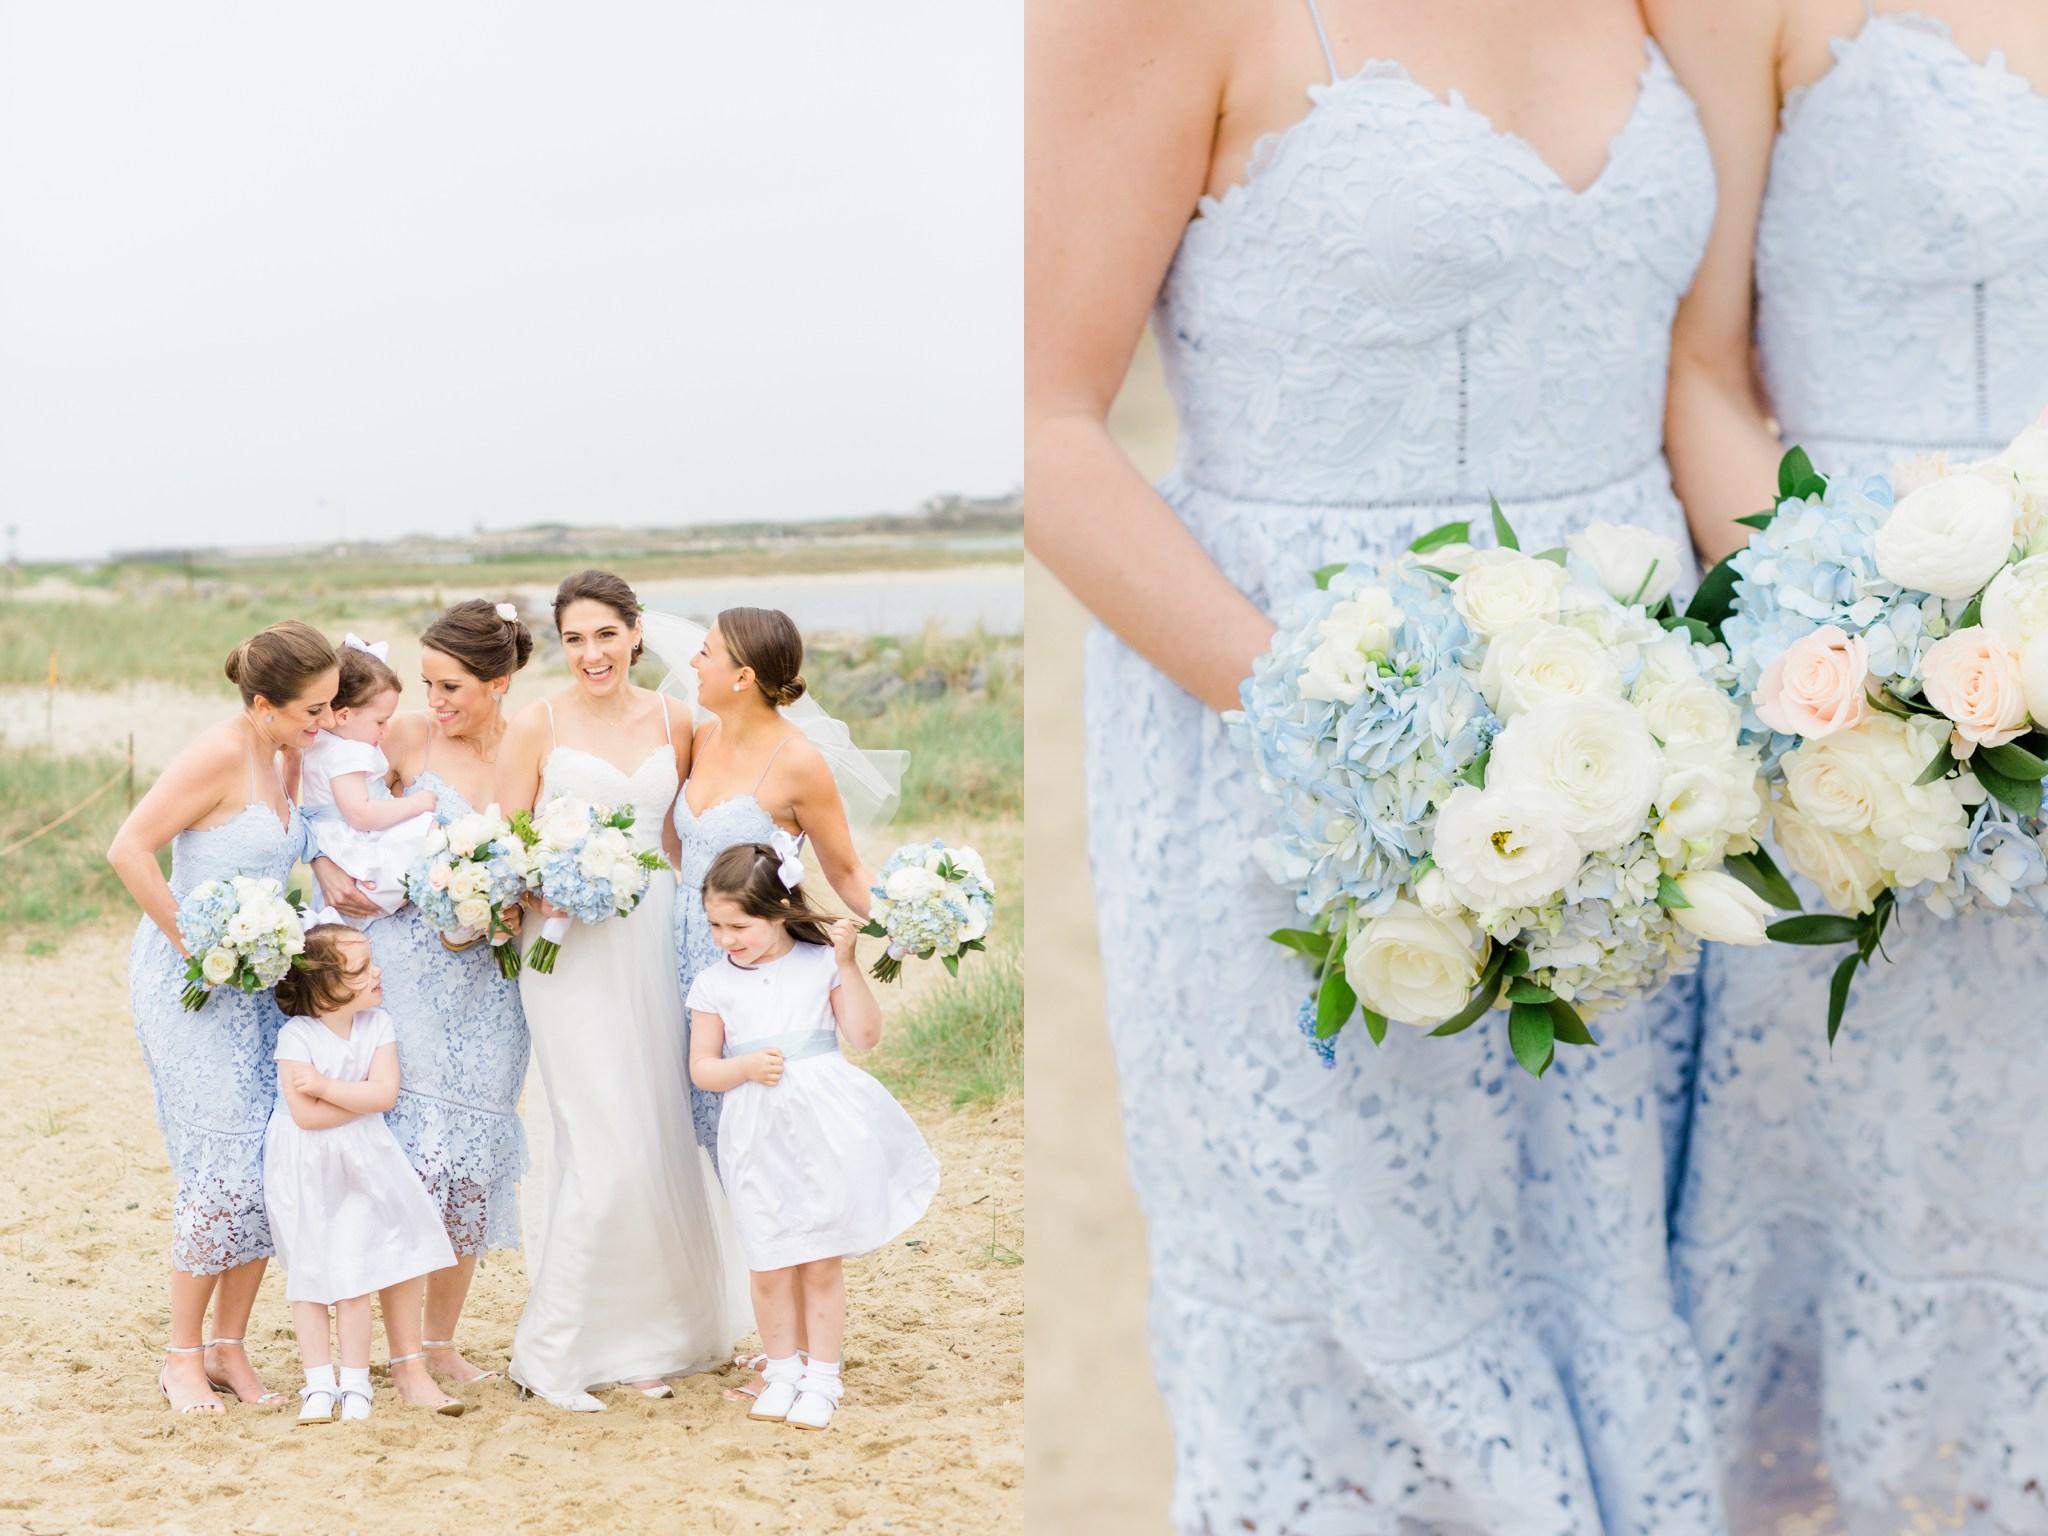 cape_cod_wedding_deborah_zoe_Photography_00037.JPG